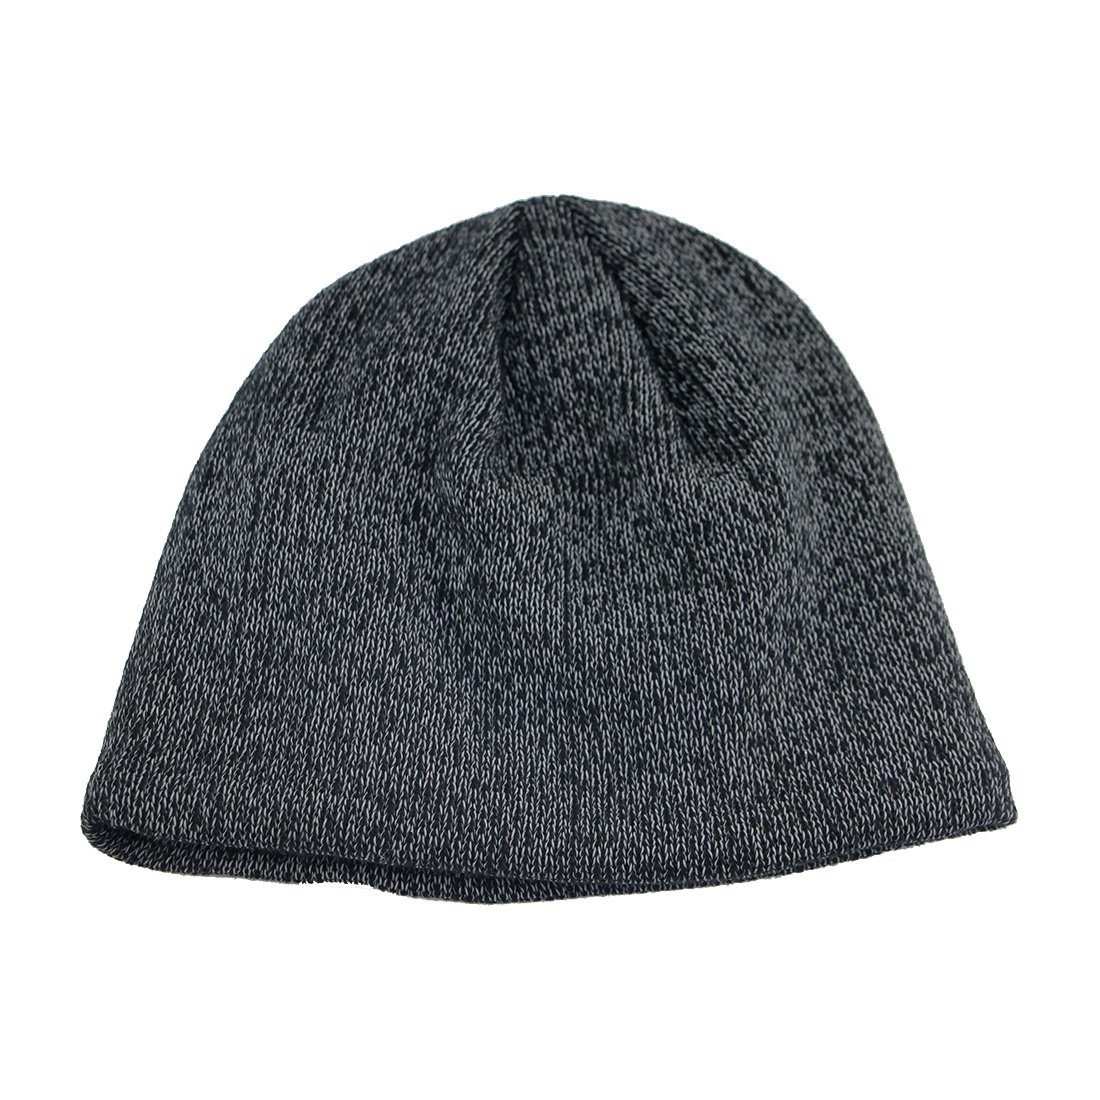 6d21e76a86a0 EZGO Warm Reflective Knitted Winter Beanie Hat, Unisex Winter ...